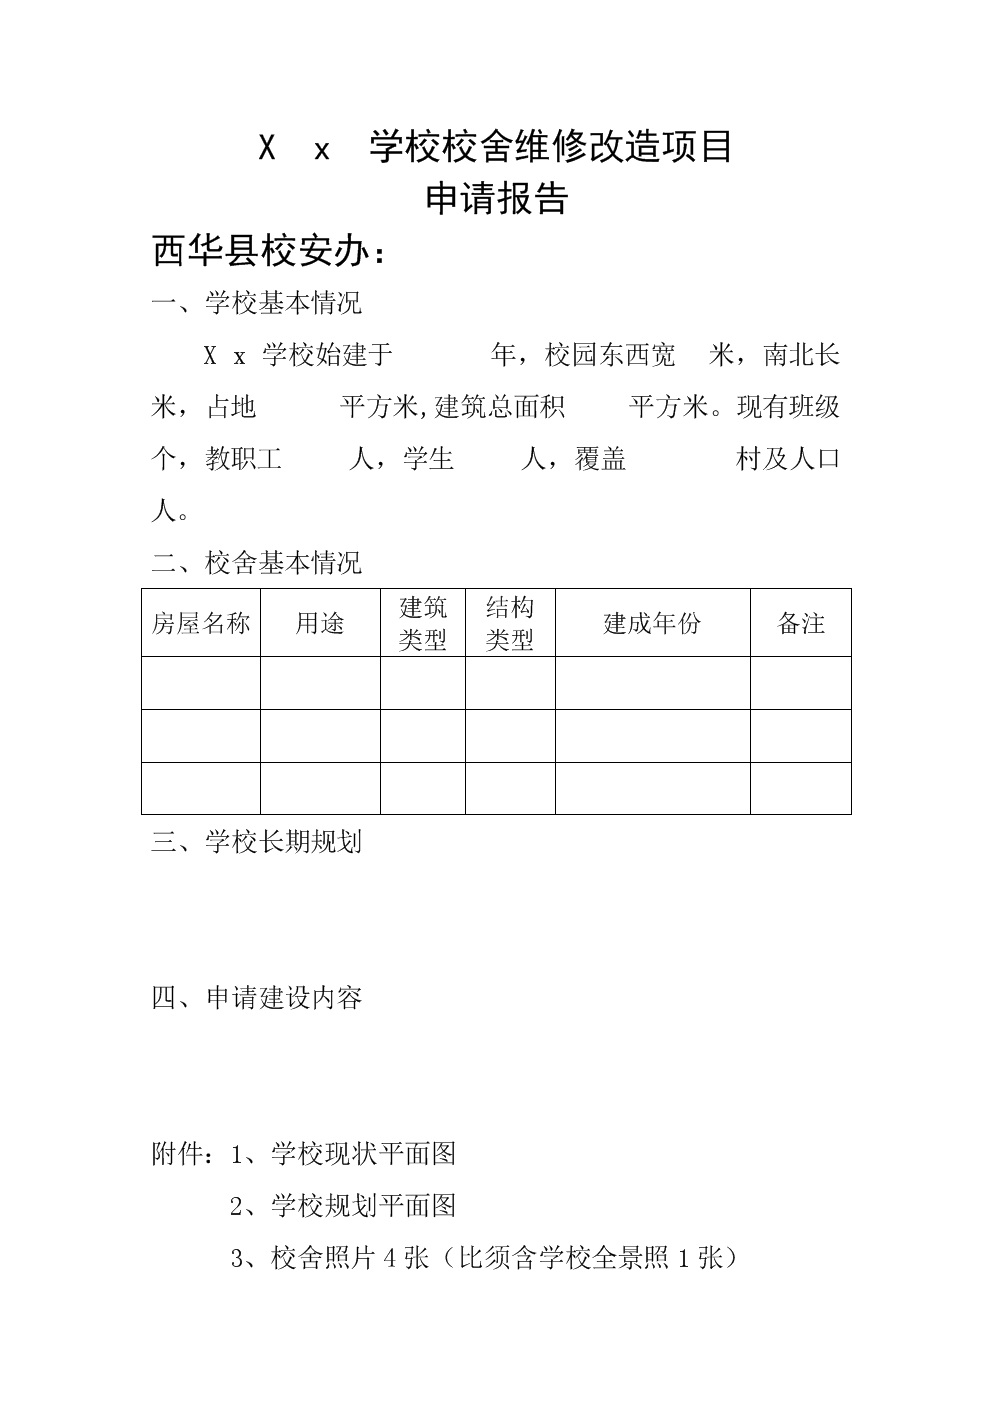 xx学校校舍维修改造项目申请报告(式样).doc